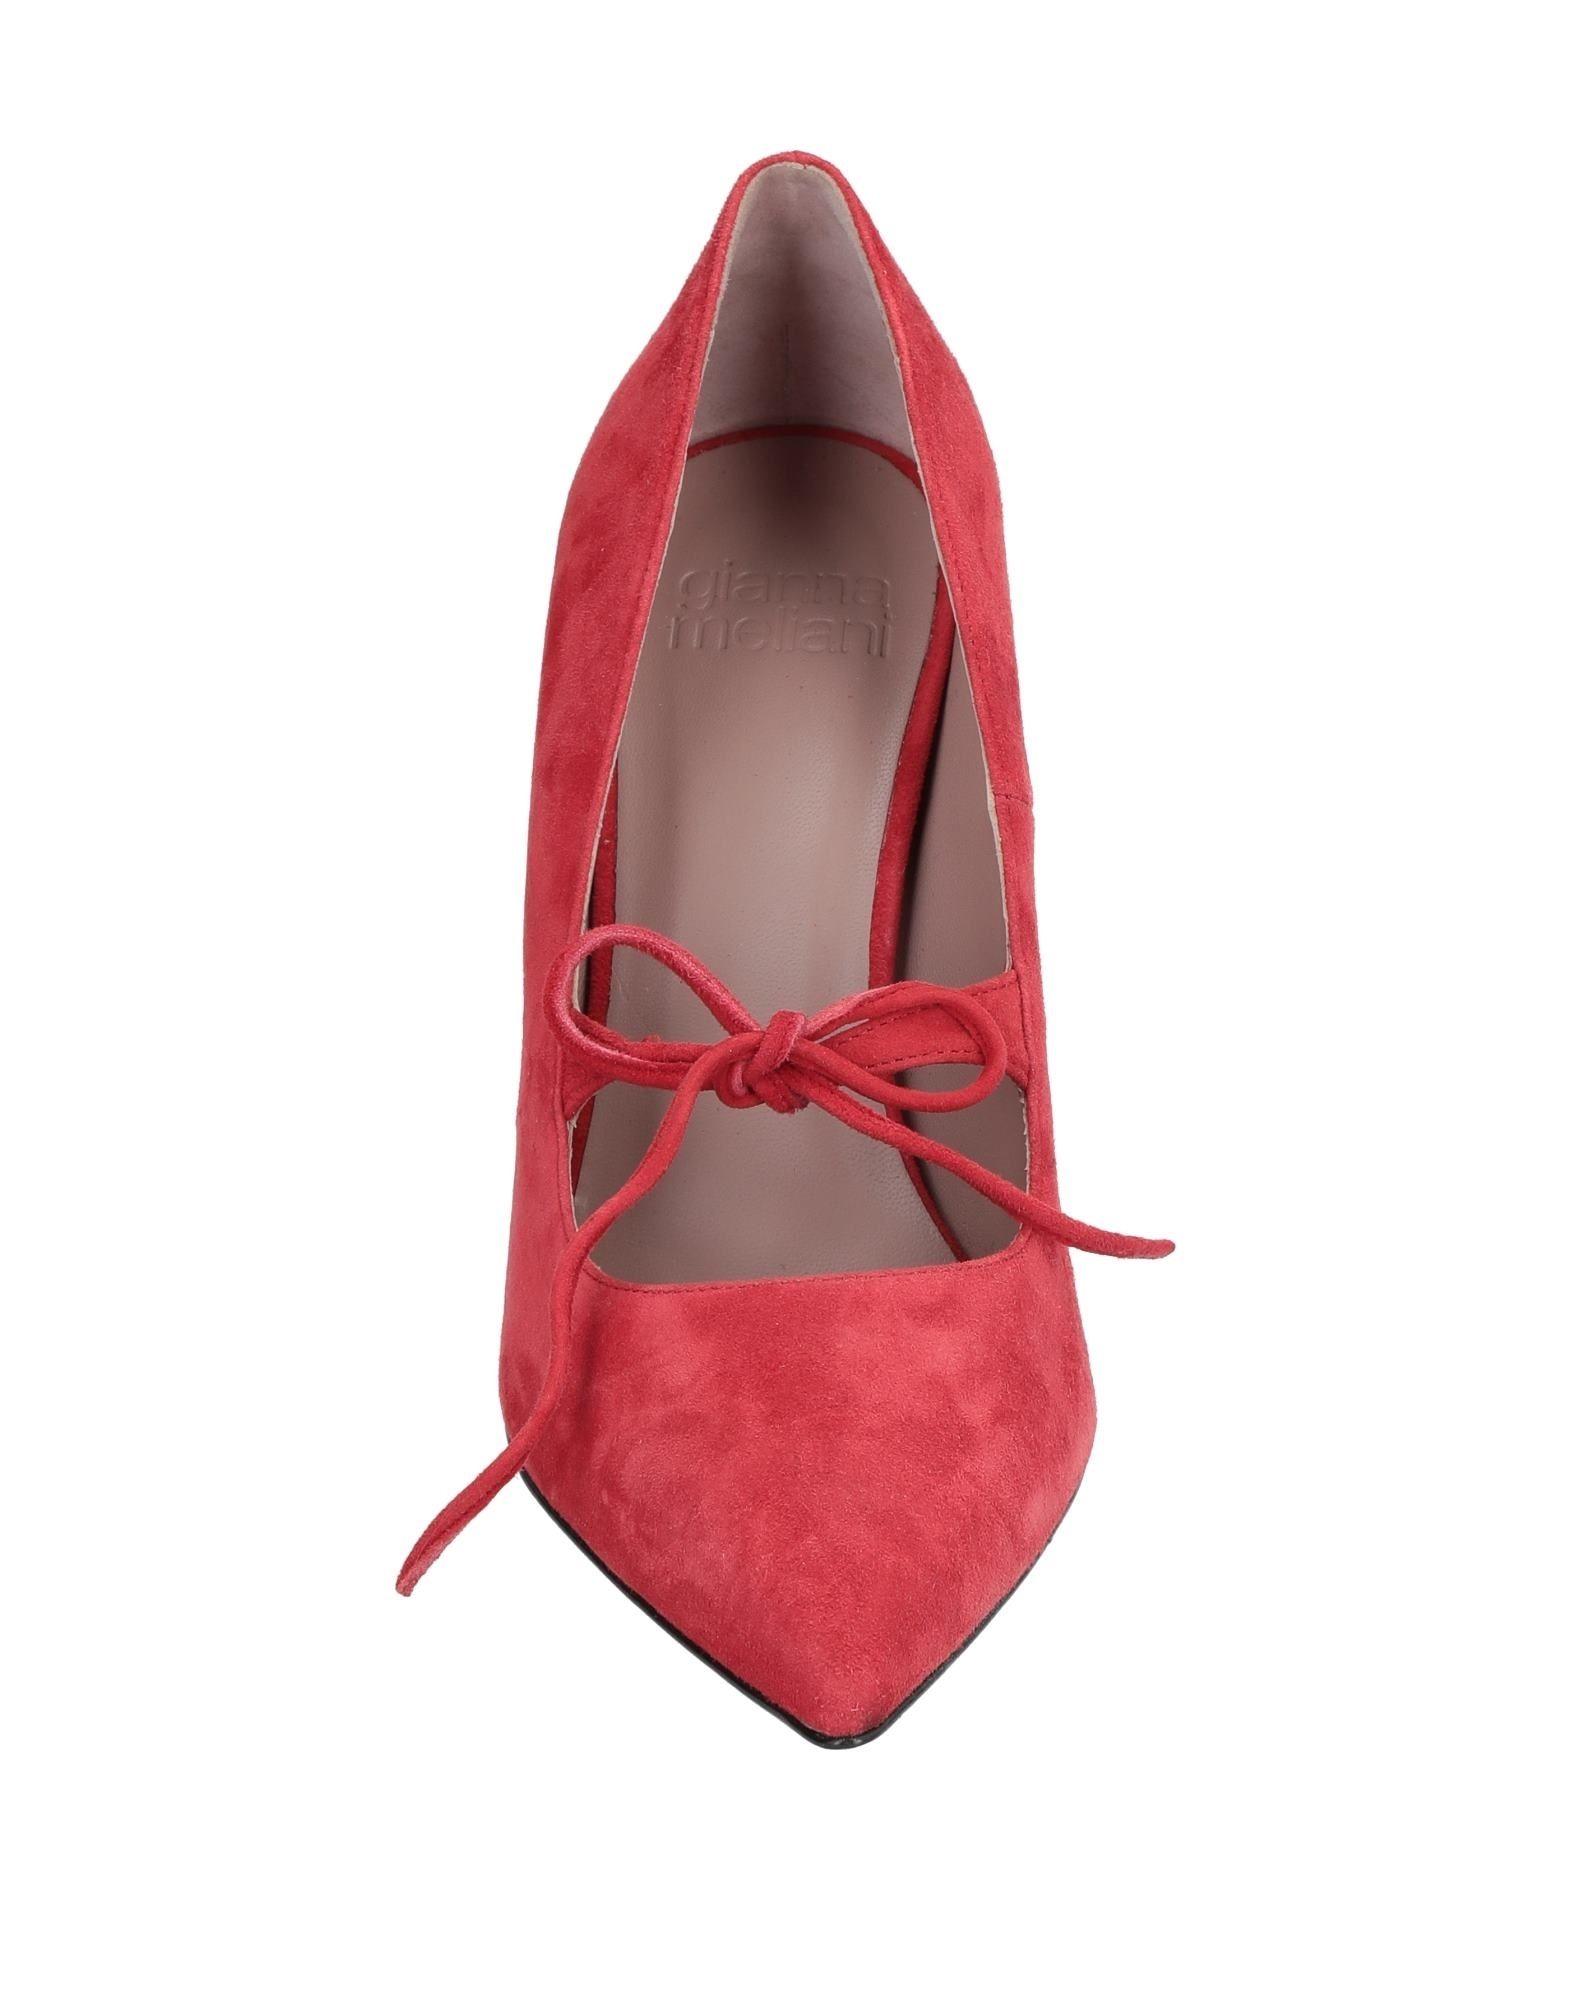 Stilvolle Pumps billige Schuhe Gianna Meliani Pumps Stilvolle Damen  11507176TC edbeff